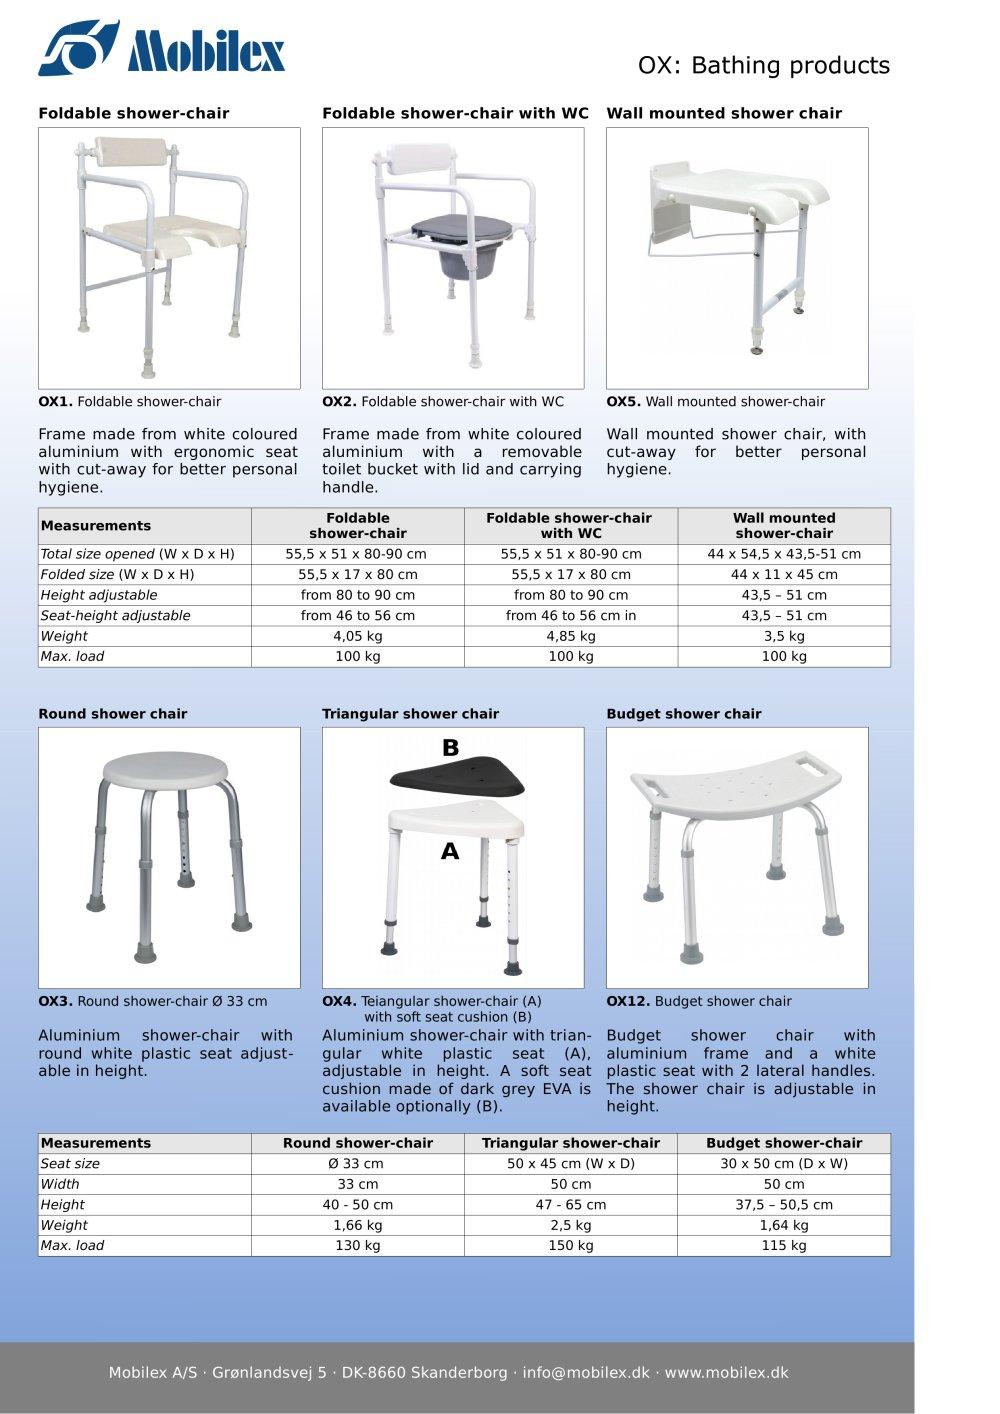 Bath Products: shower stools, swivel bath seat, etc. - Mobilex A/S ...